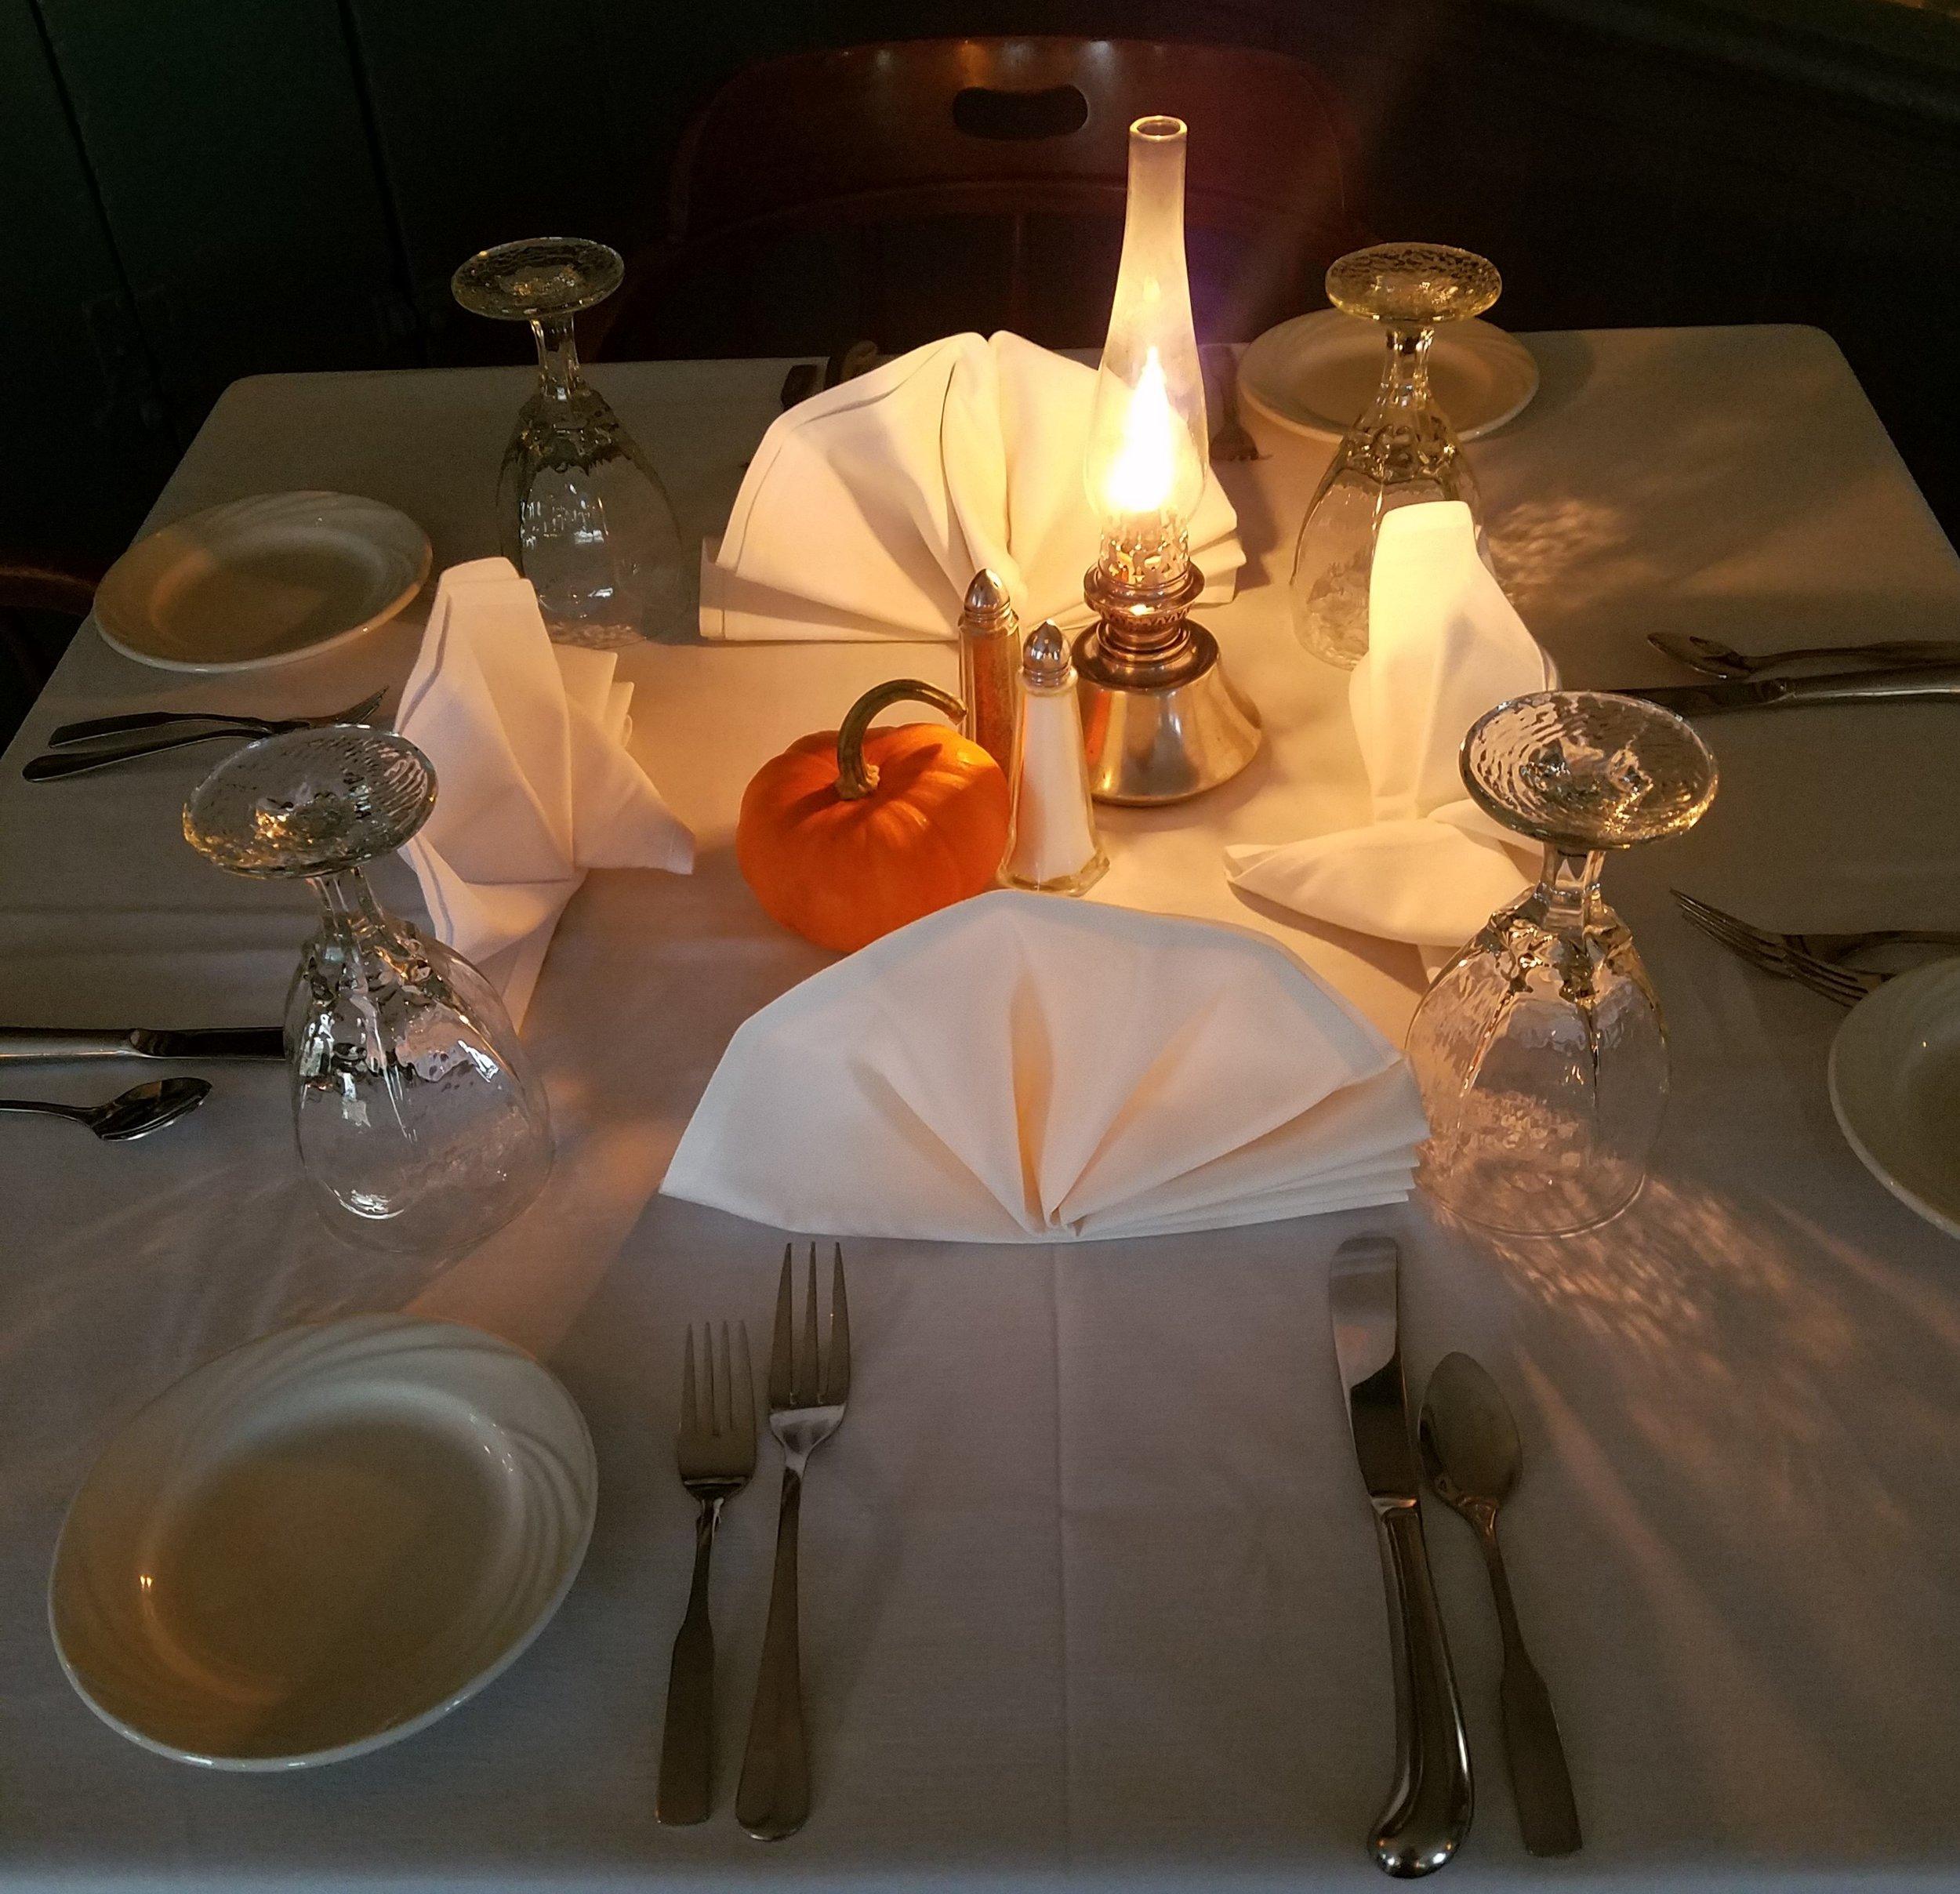 table 21 with pumpkin october 2017.jpg